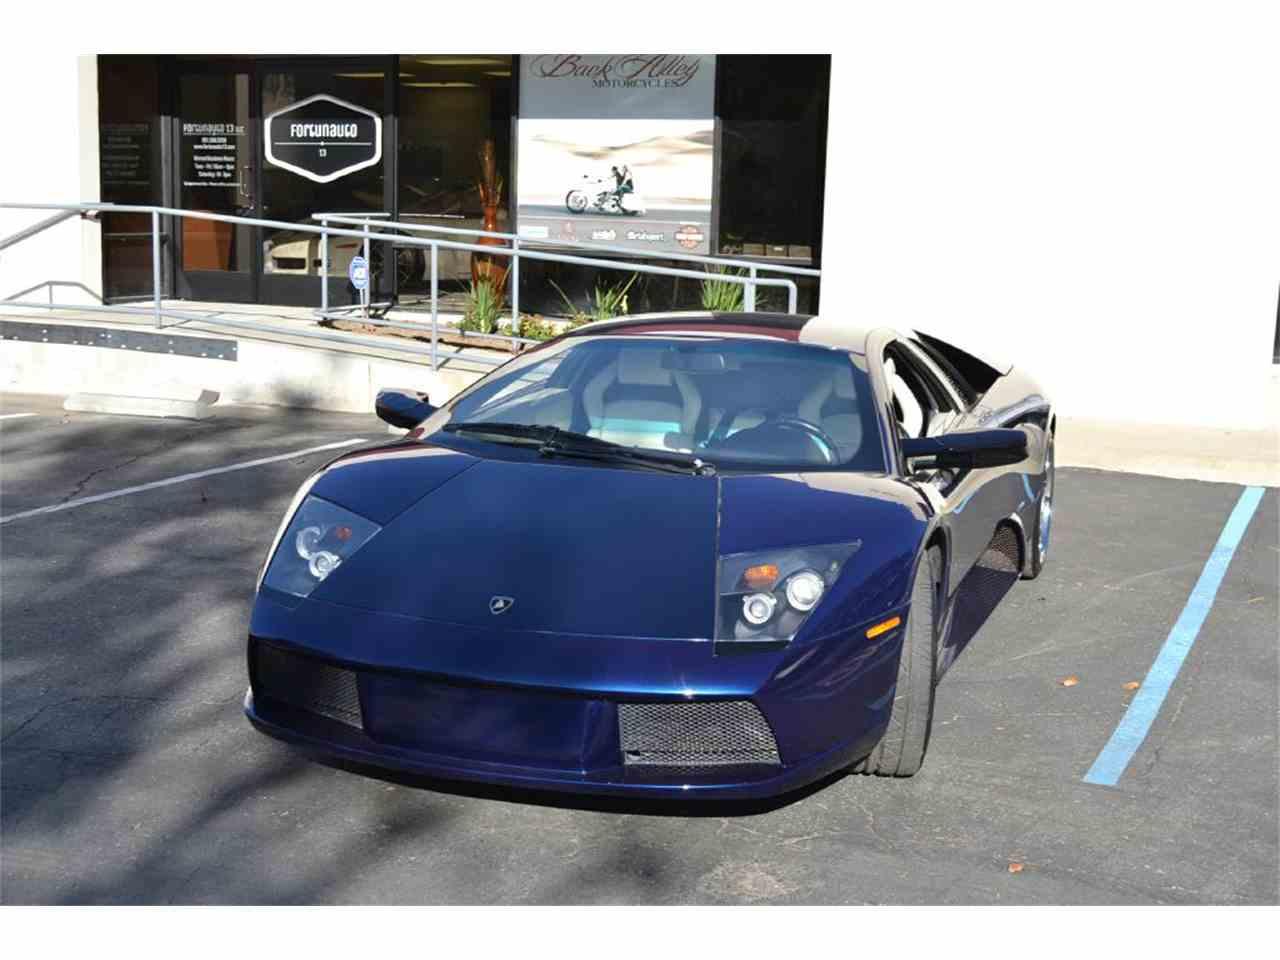 Large Picture of '04 Lamborghini Murcielago located in California - $110,000.00 - LVJ1